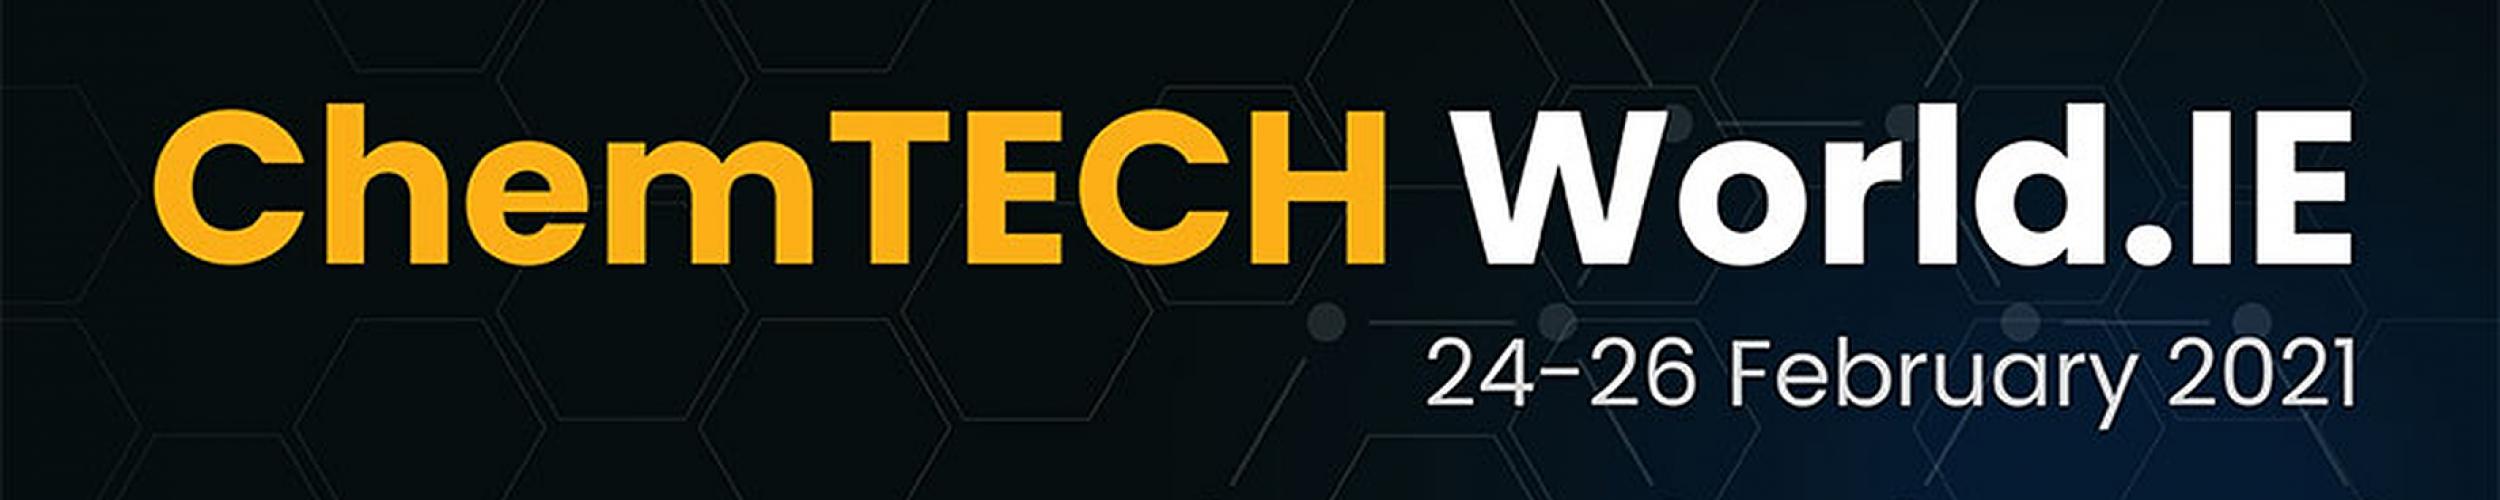 24-26 February 2021 - ChemTECH World.IE